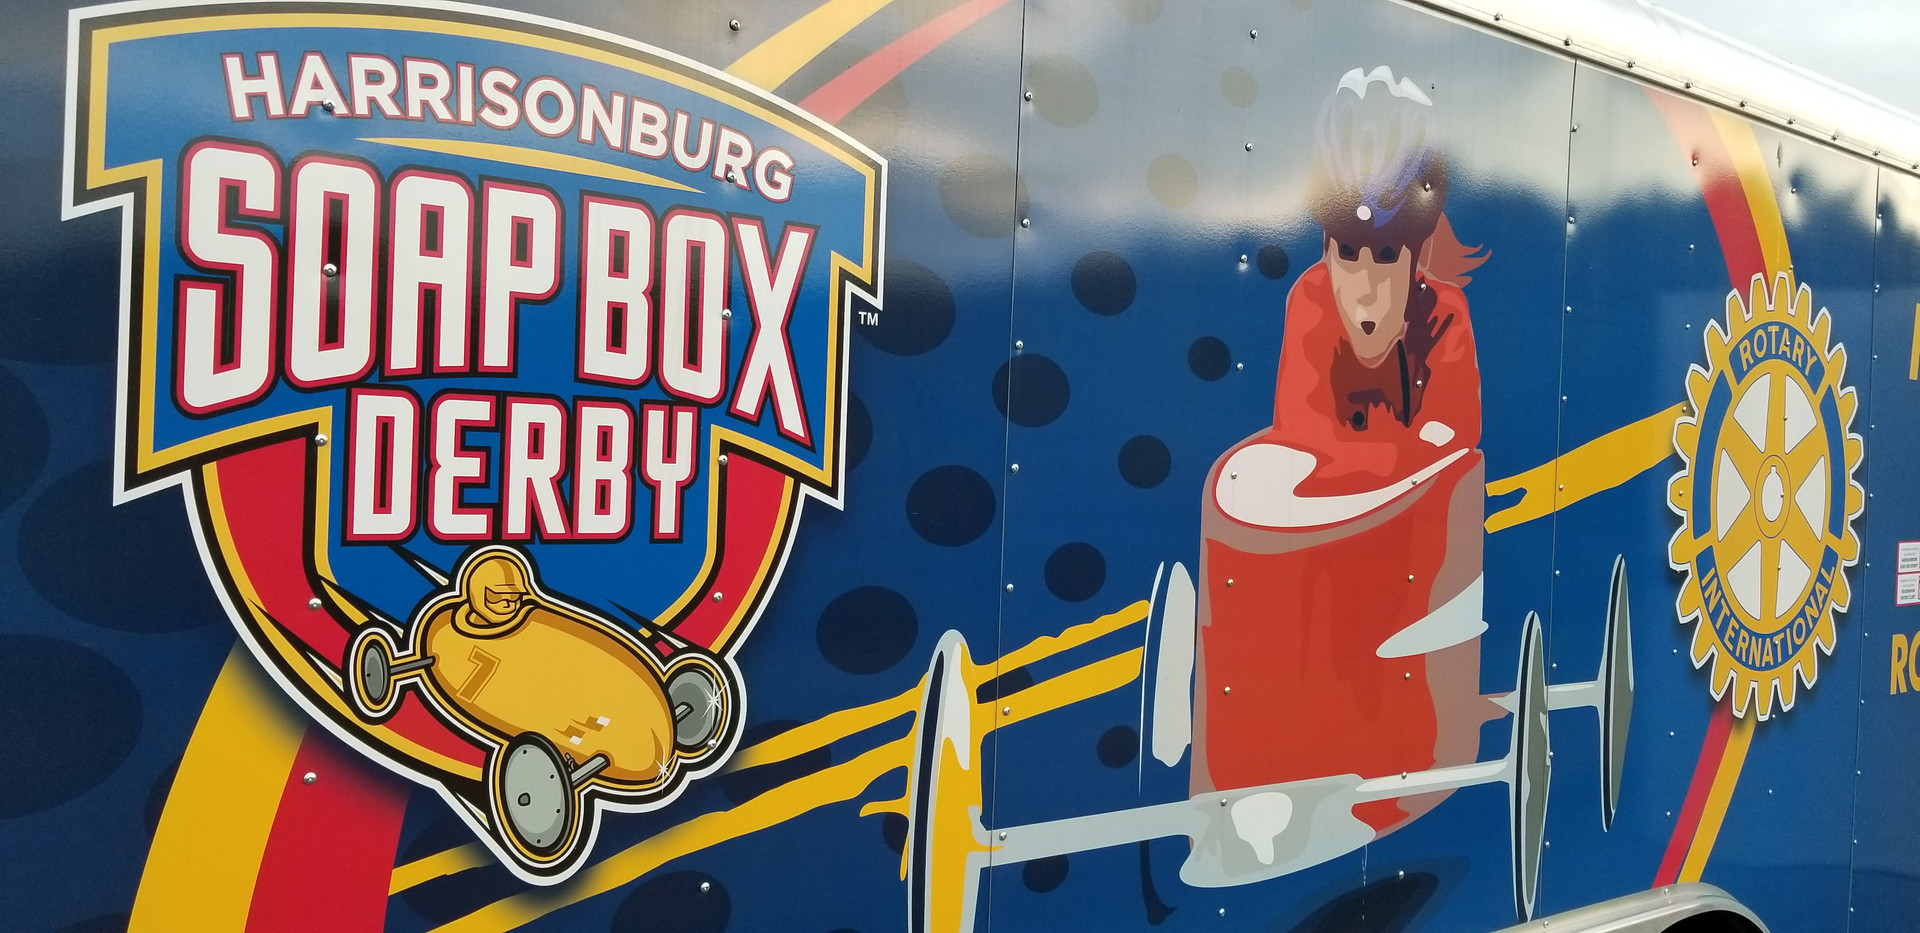 Harrisonburg Soap Box Derby